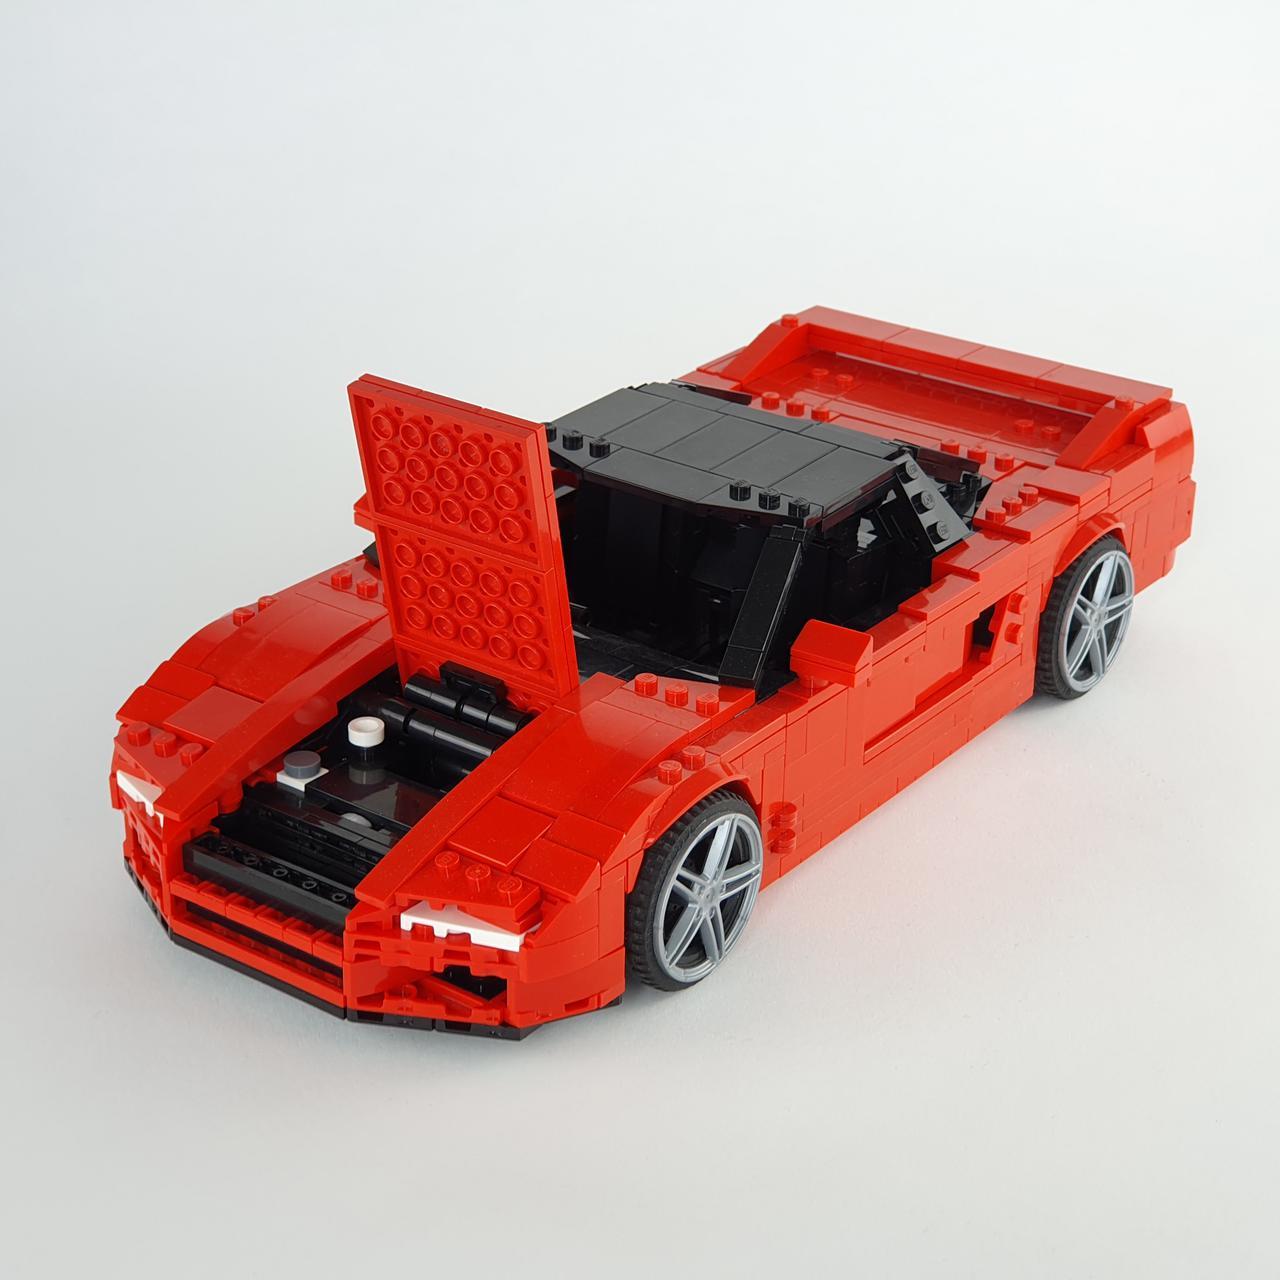 1280x1280.jpg